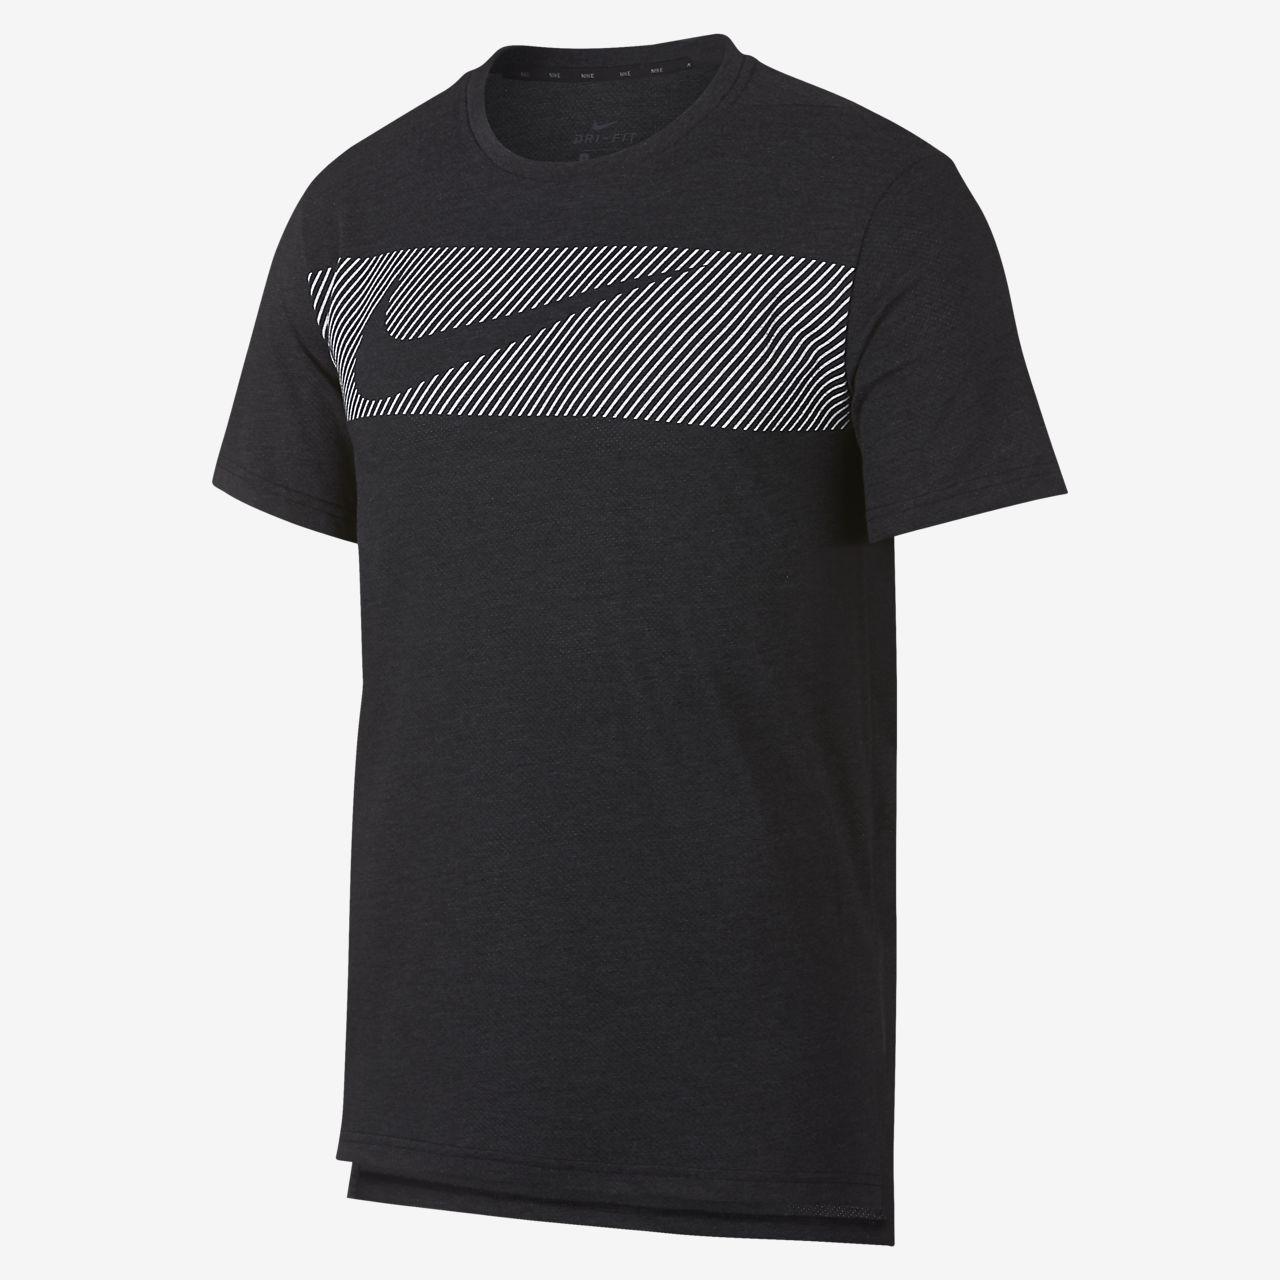 Breathe Para Nike Entrenamiento Camiseta De Hombre Manga Corta wO8X0Pkn